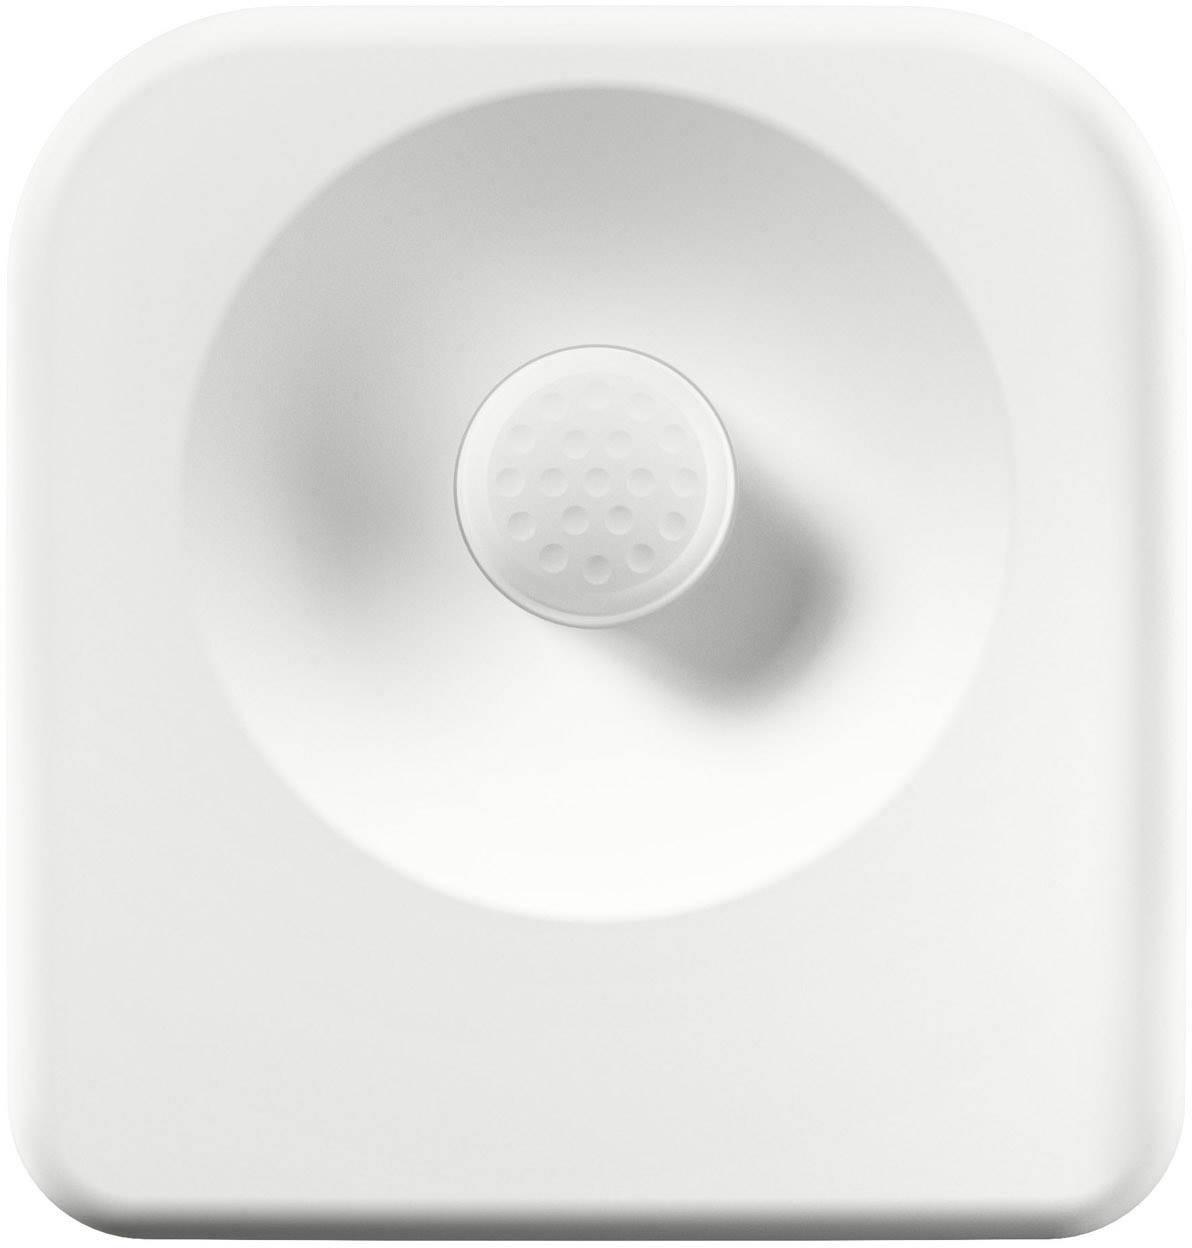 Bezdrátový detektor pohybu OSRAM Lightify